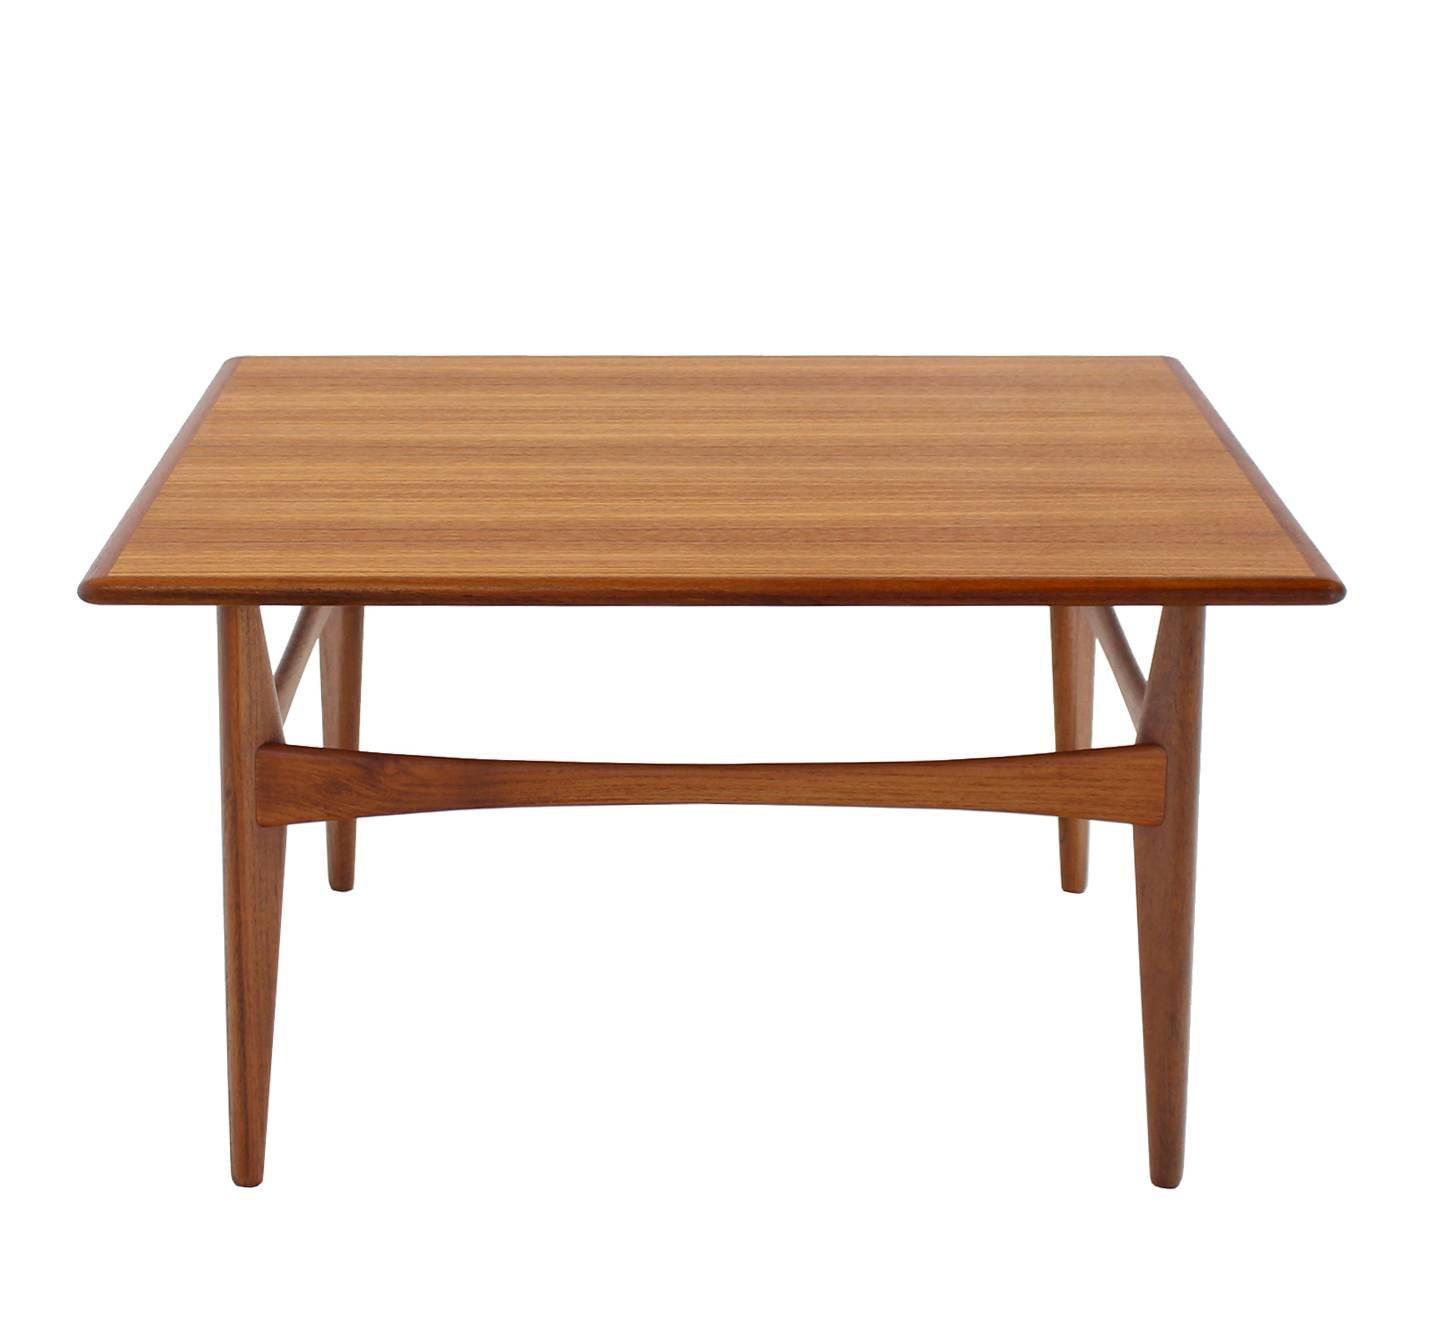 Danish Mid Century Teak Coffee Table 1 Small: Danish Mid-Century Modern Teak Square Coffee Side Table